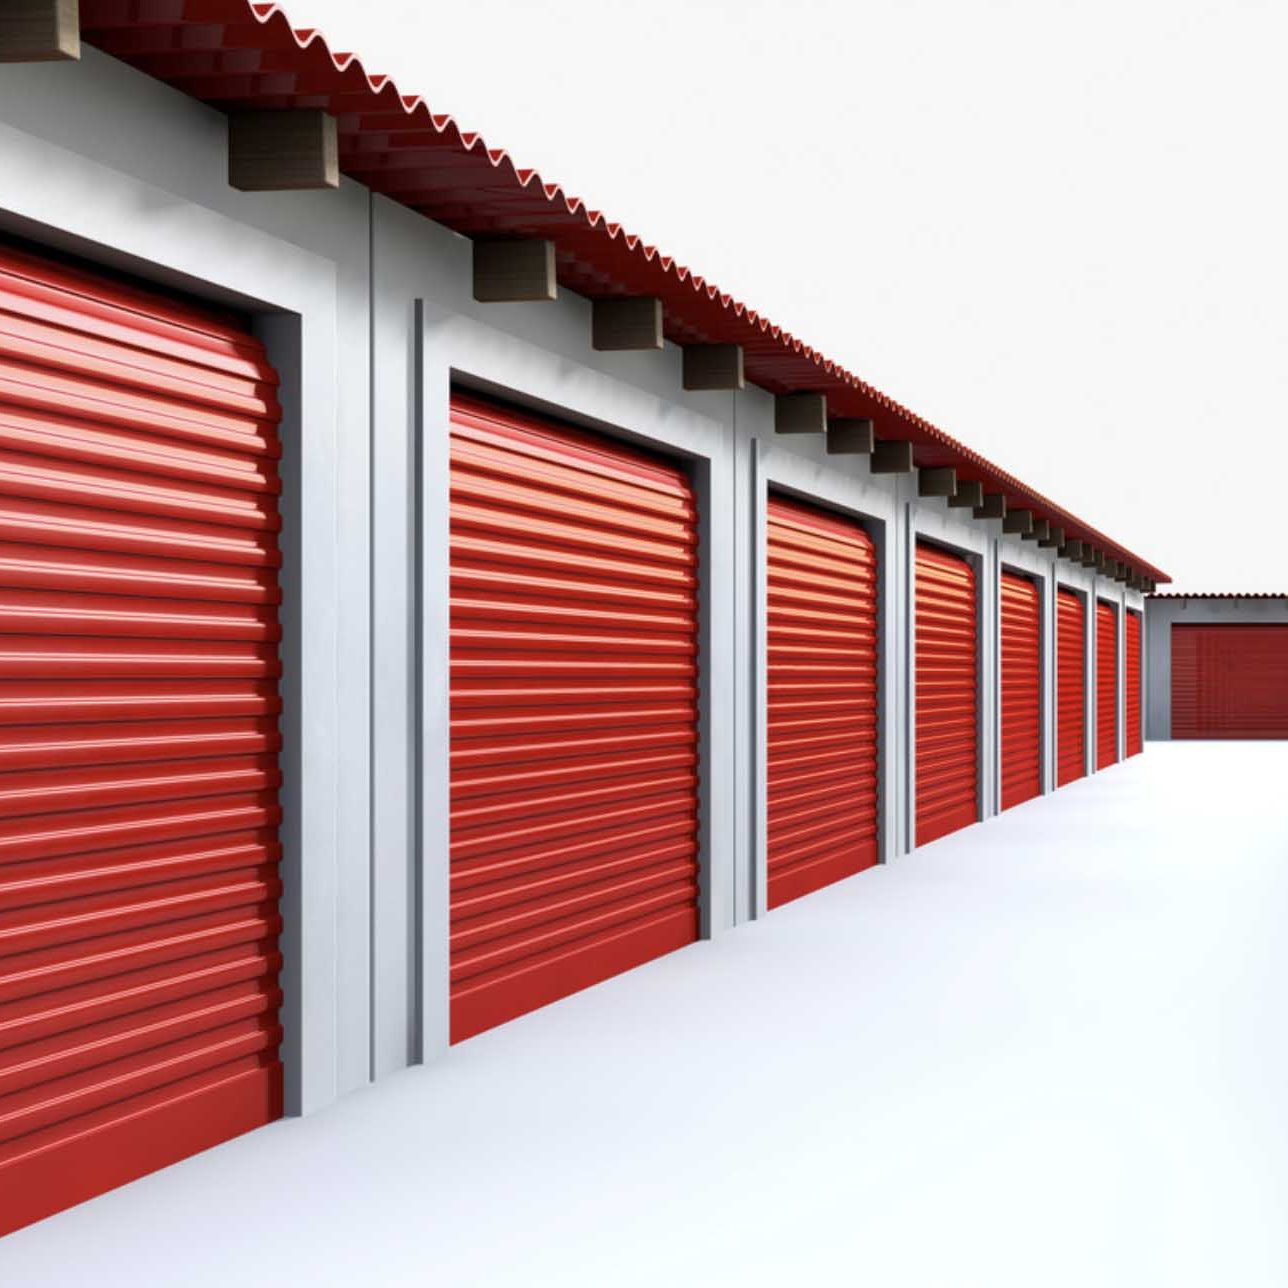 Houston storage and moving